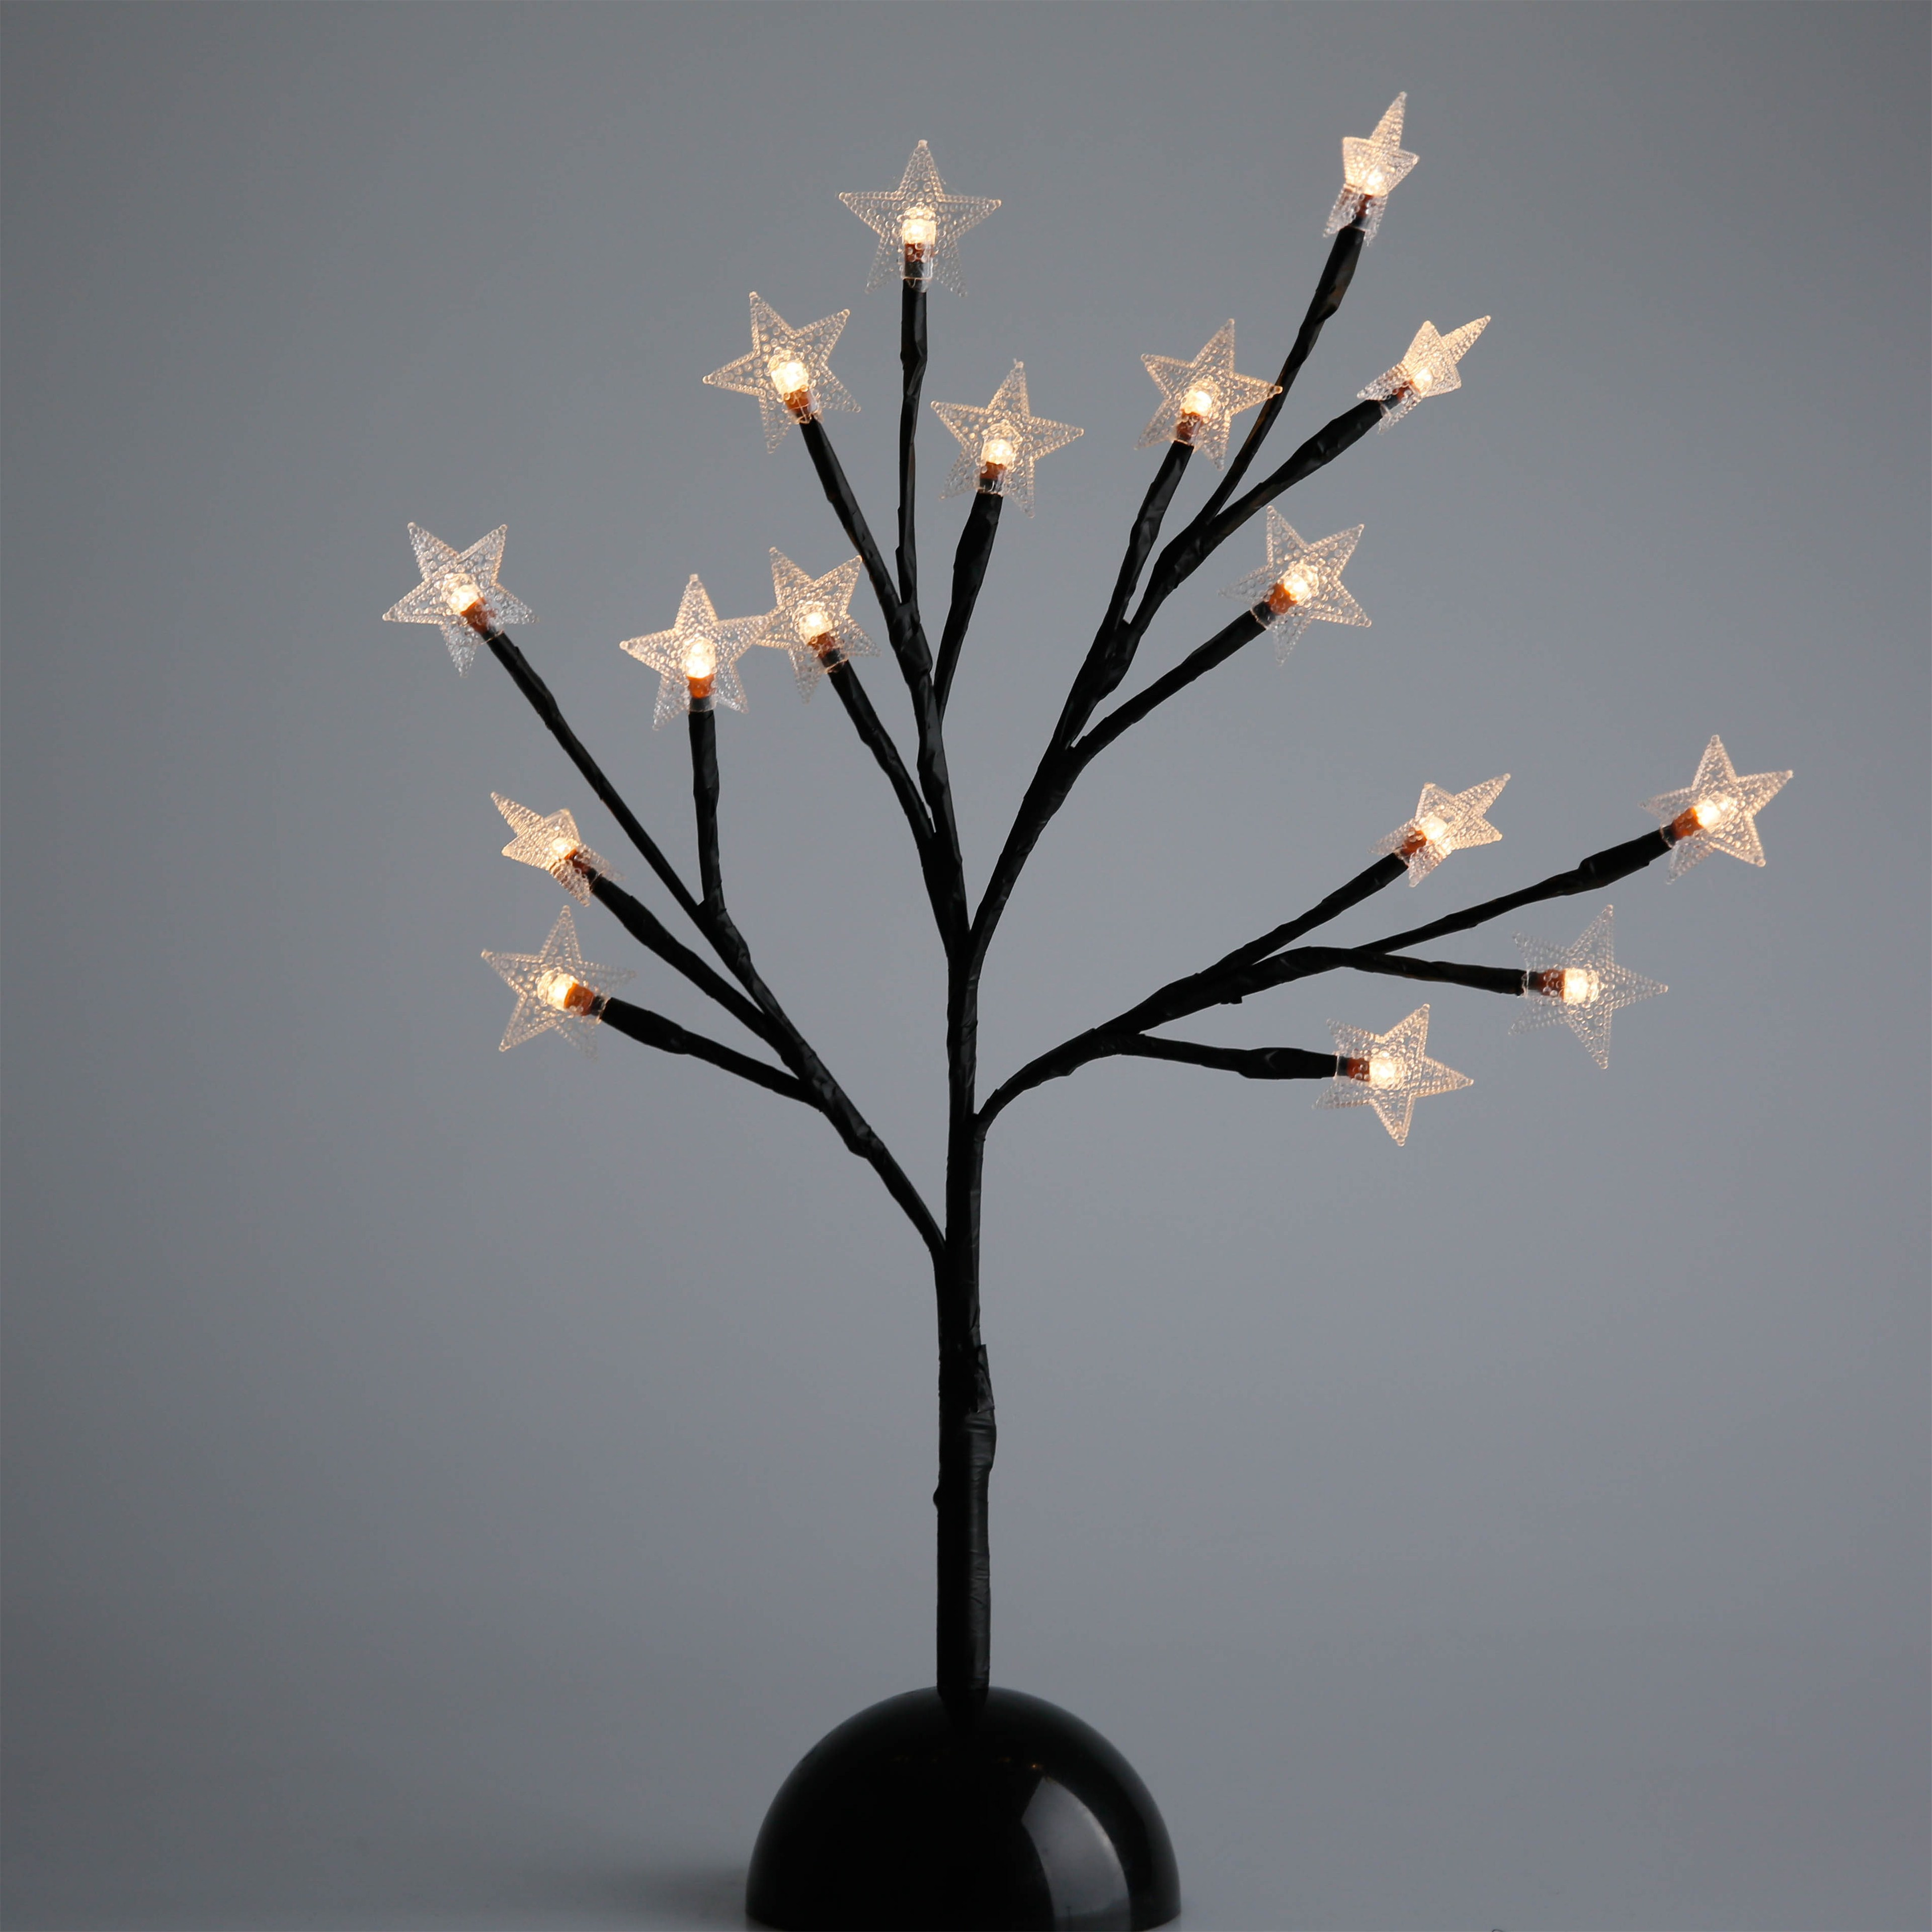 Most Popular Christmas Tree: Ropio Most Popular Good Led Christmas Tree Imported